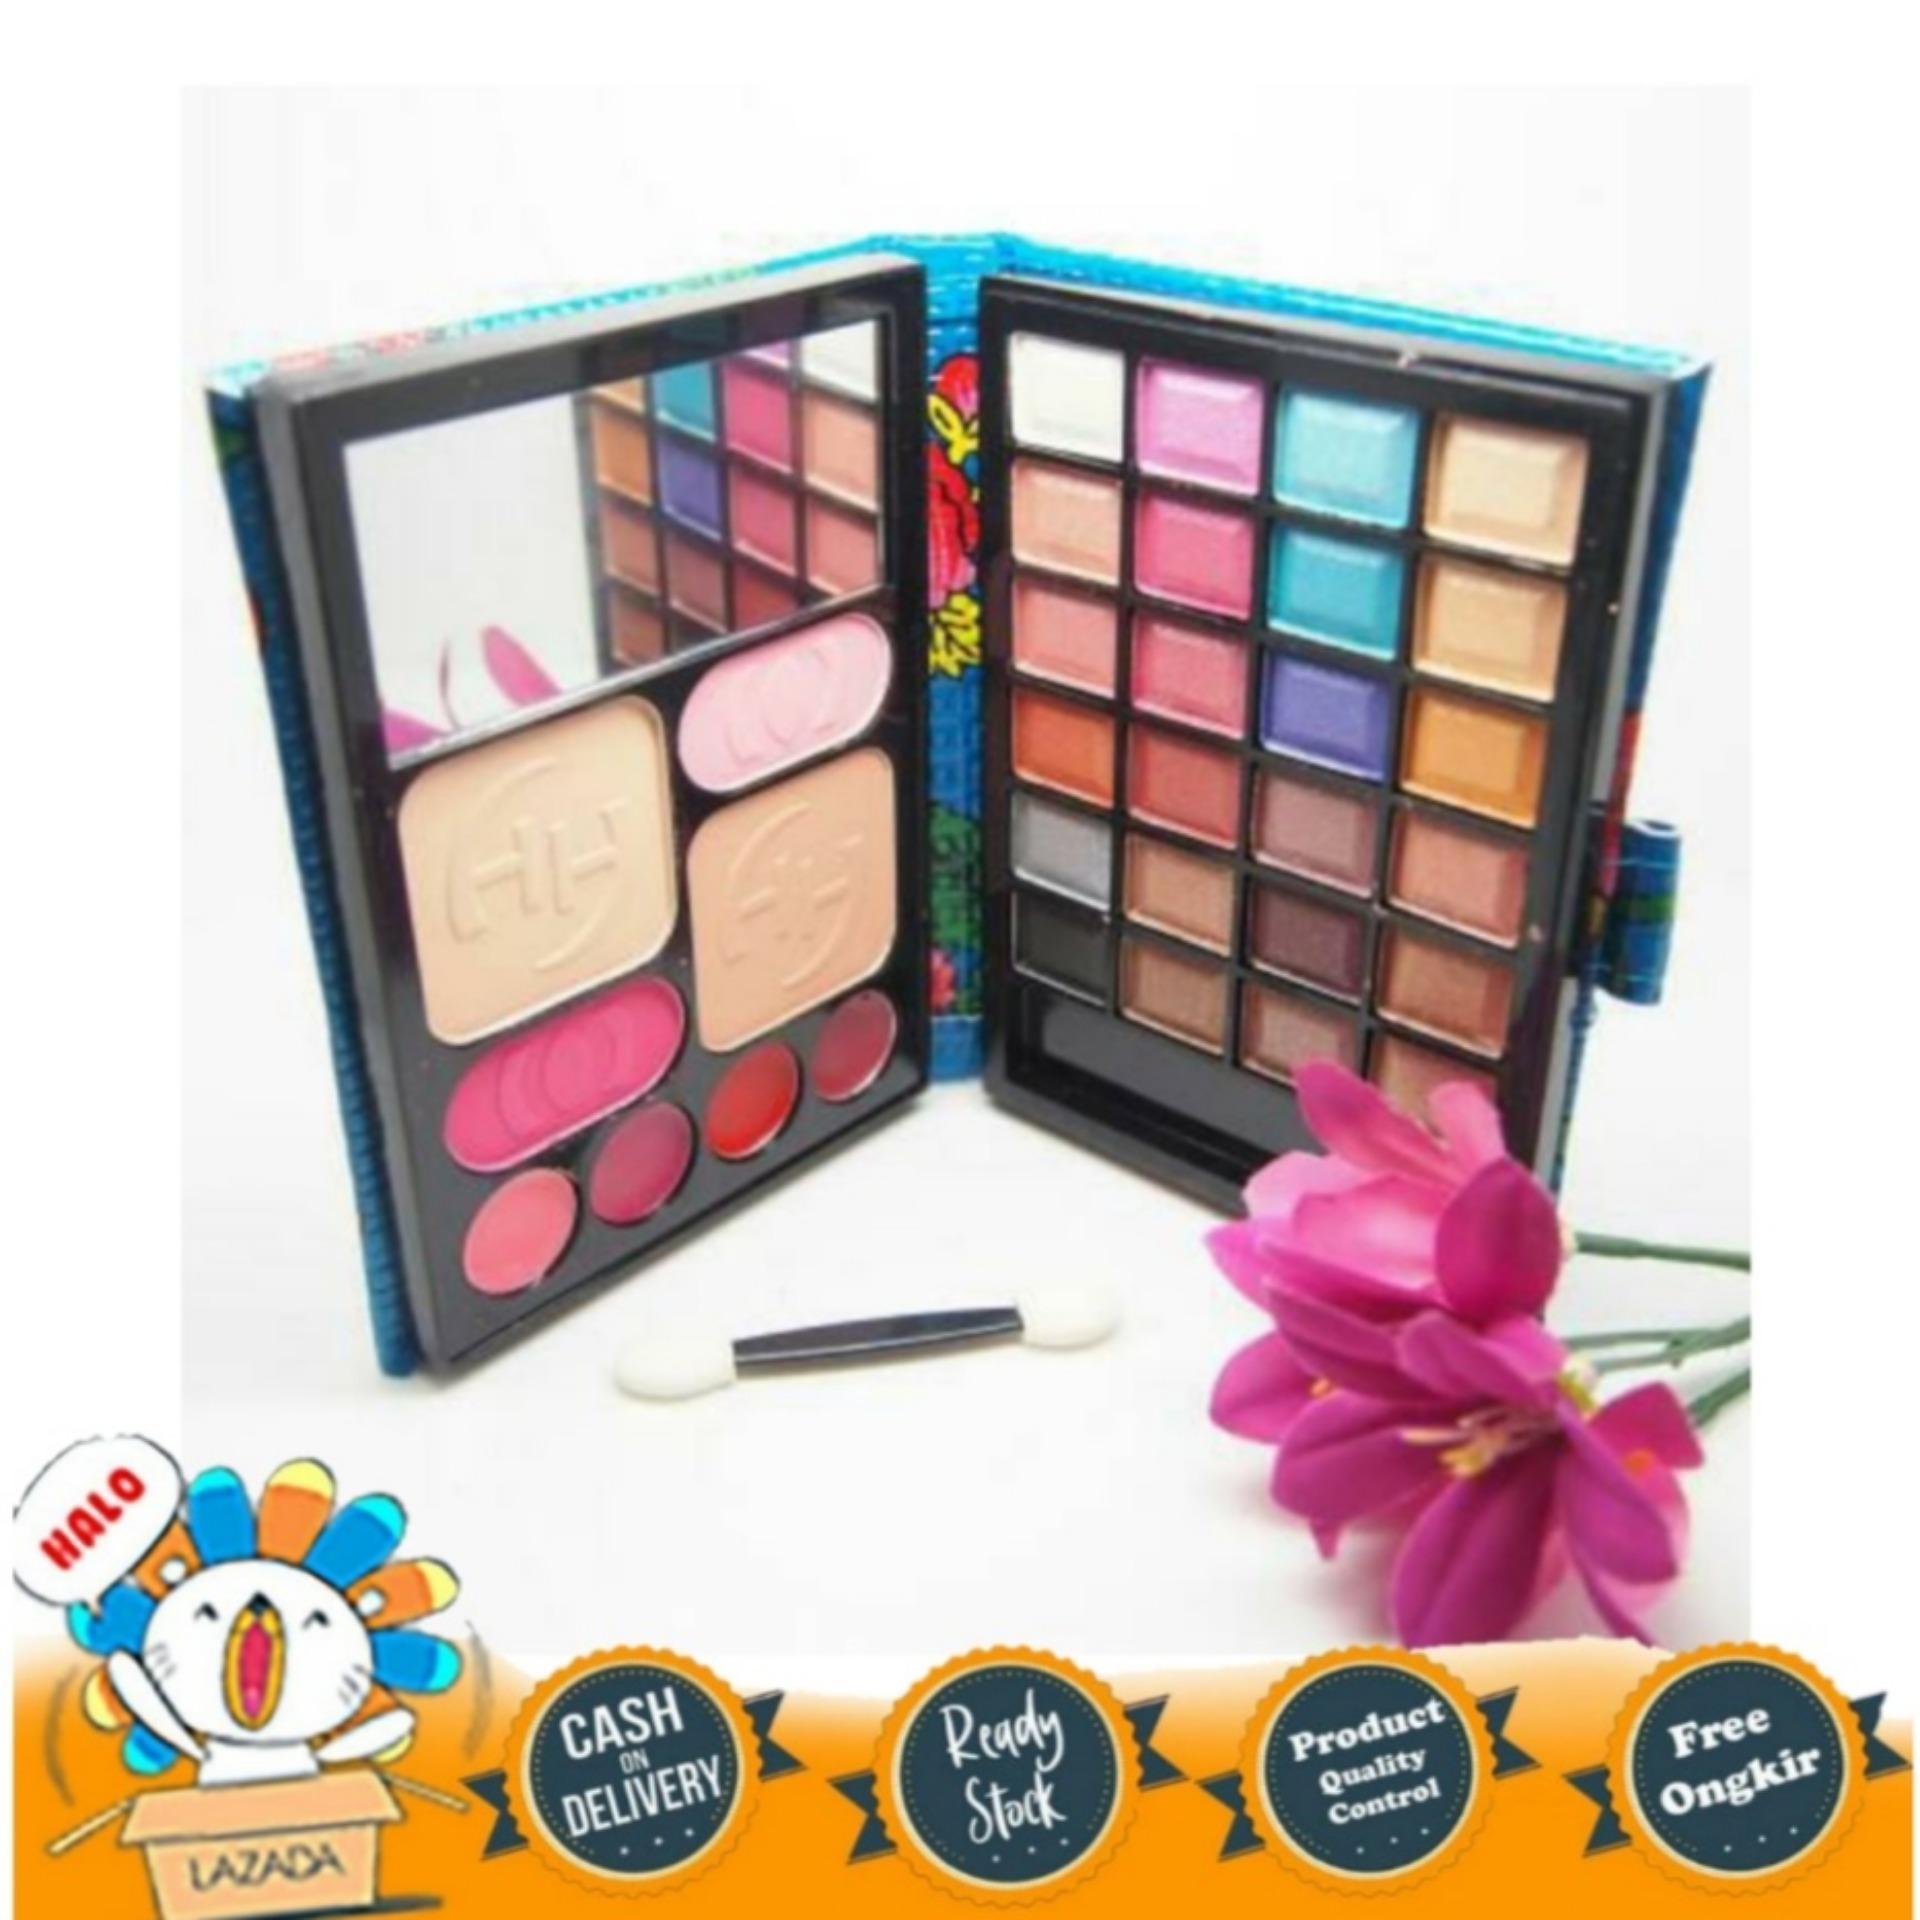 eyeshadow makeup dompet huda – 5 in1